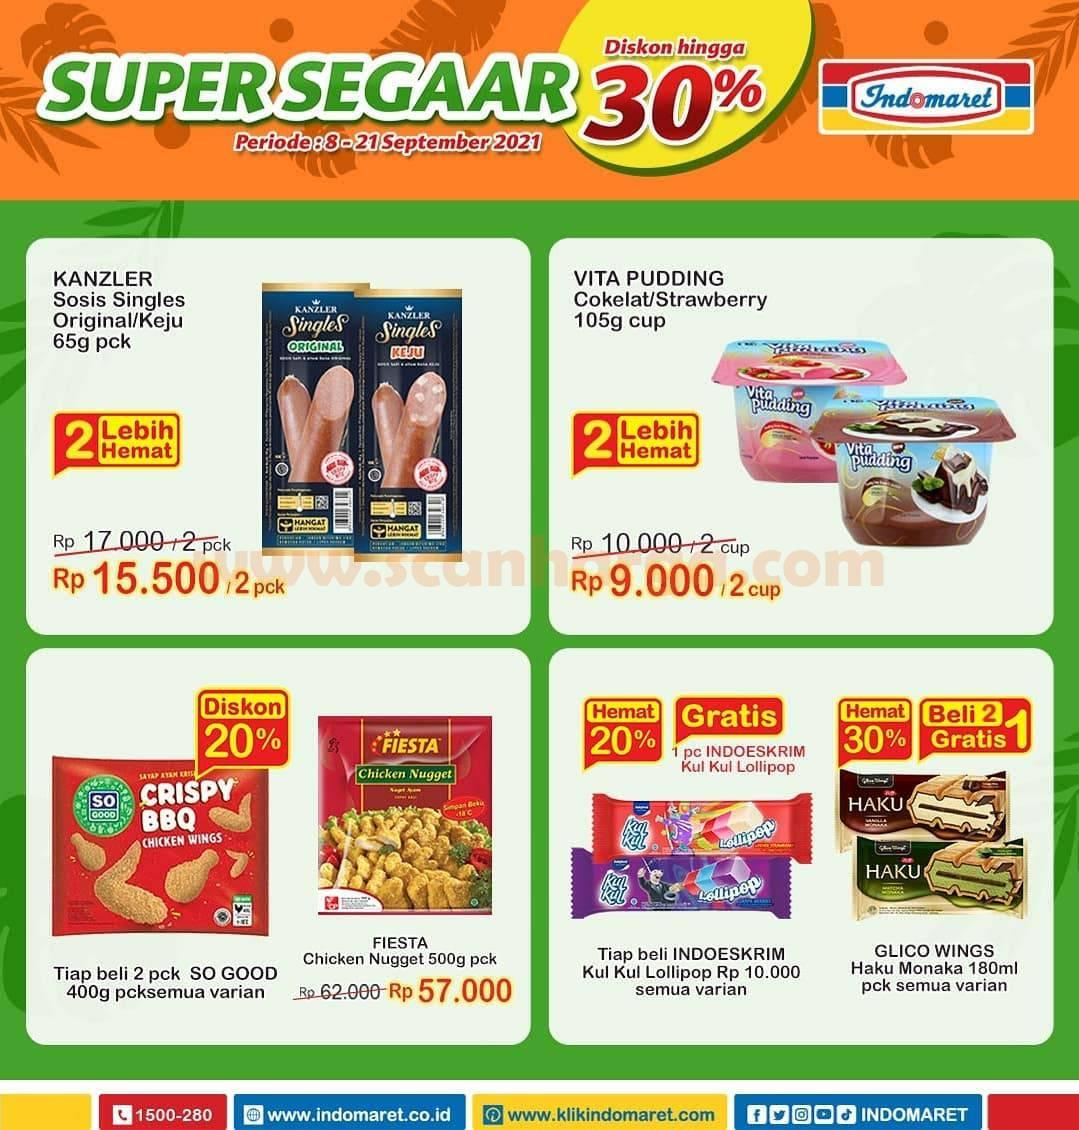 Promo INDOMARET Produk SUPER SEGAAR Periode 8 - 21 September 2021 2